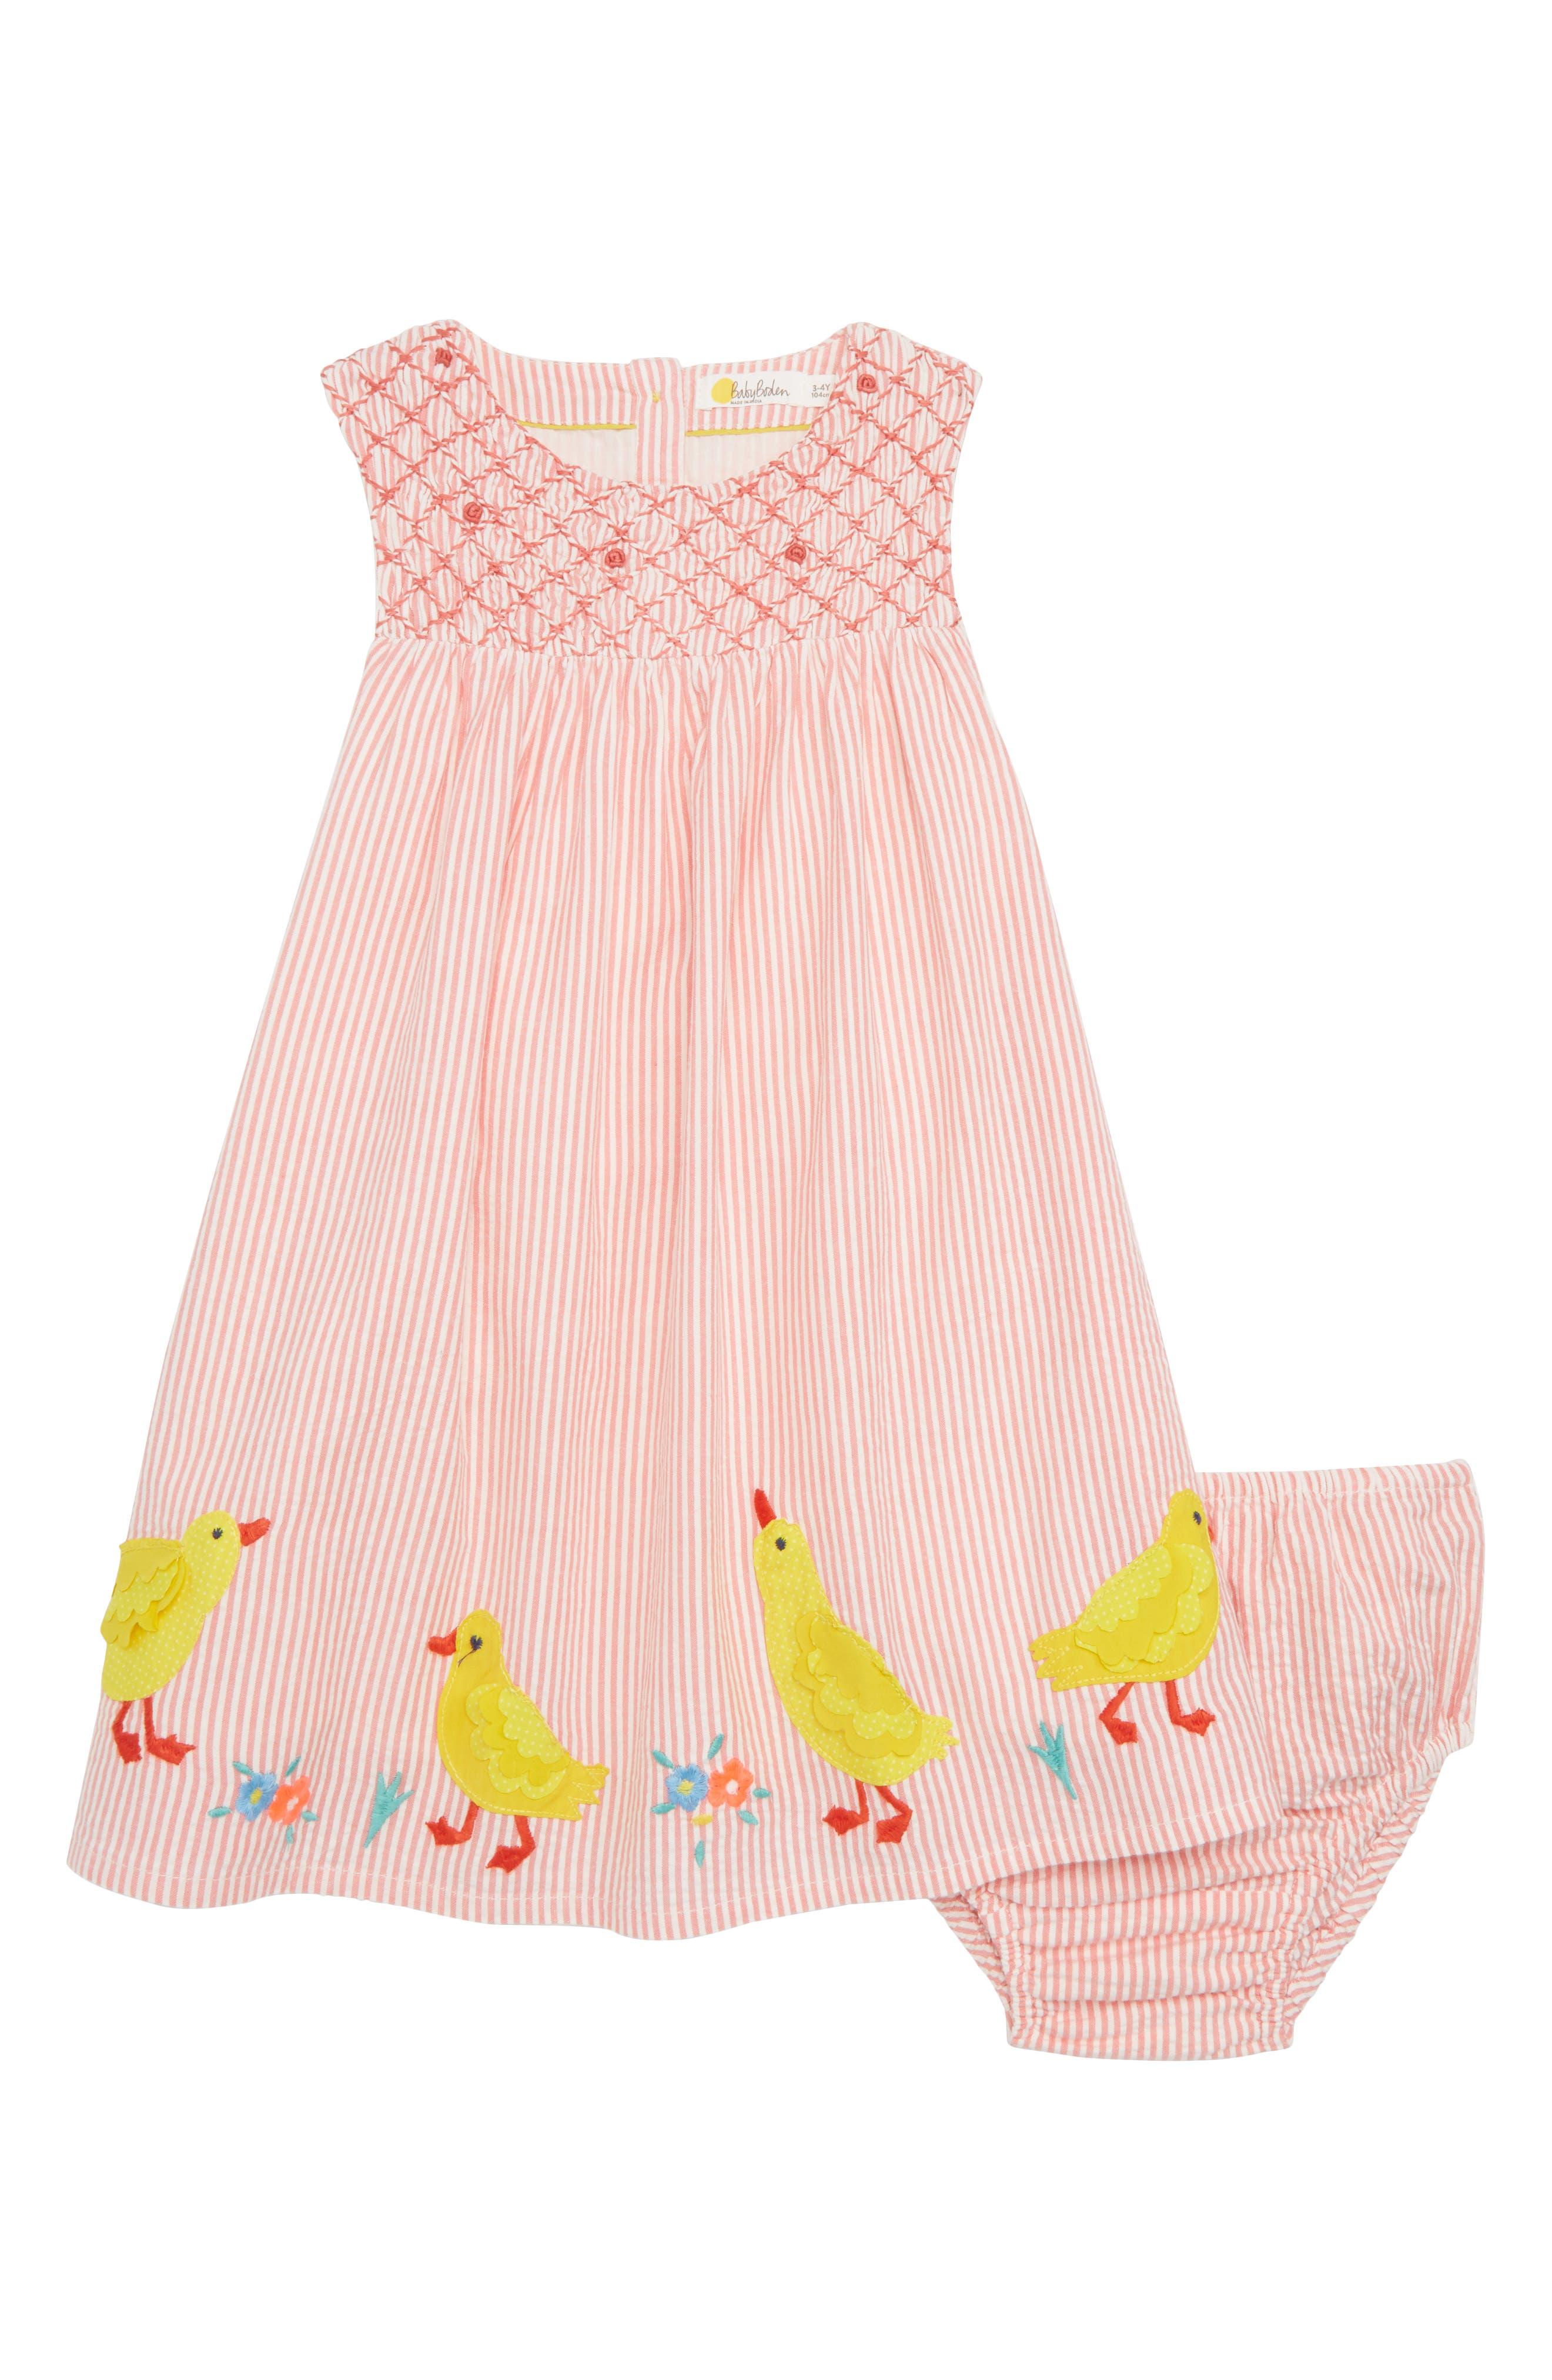 Smocked Chick Appliqué Dress,                             Main thumbnail 1, color,                             684